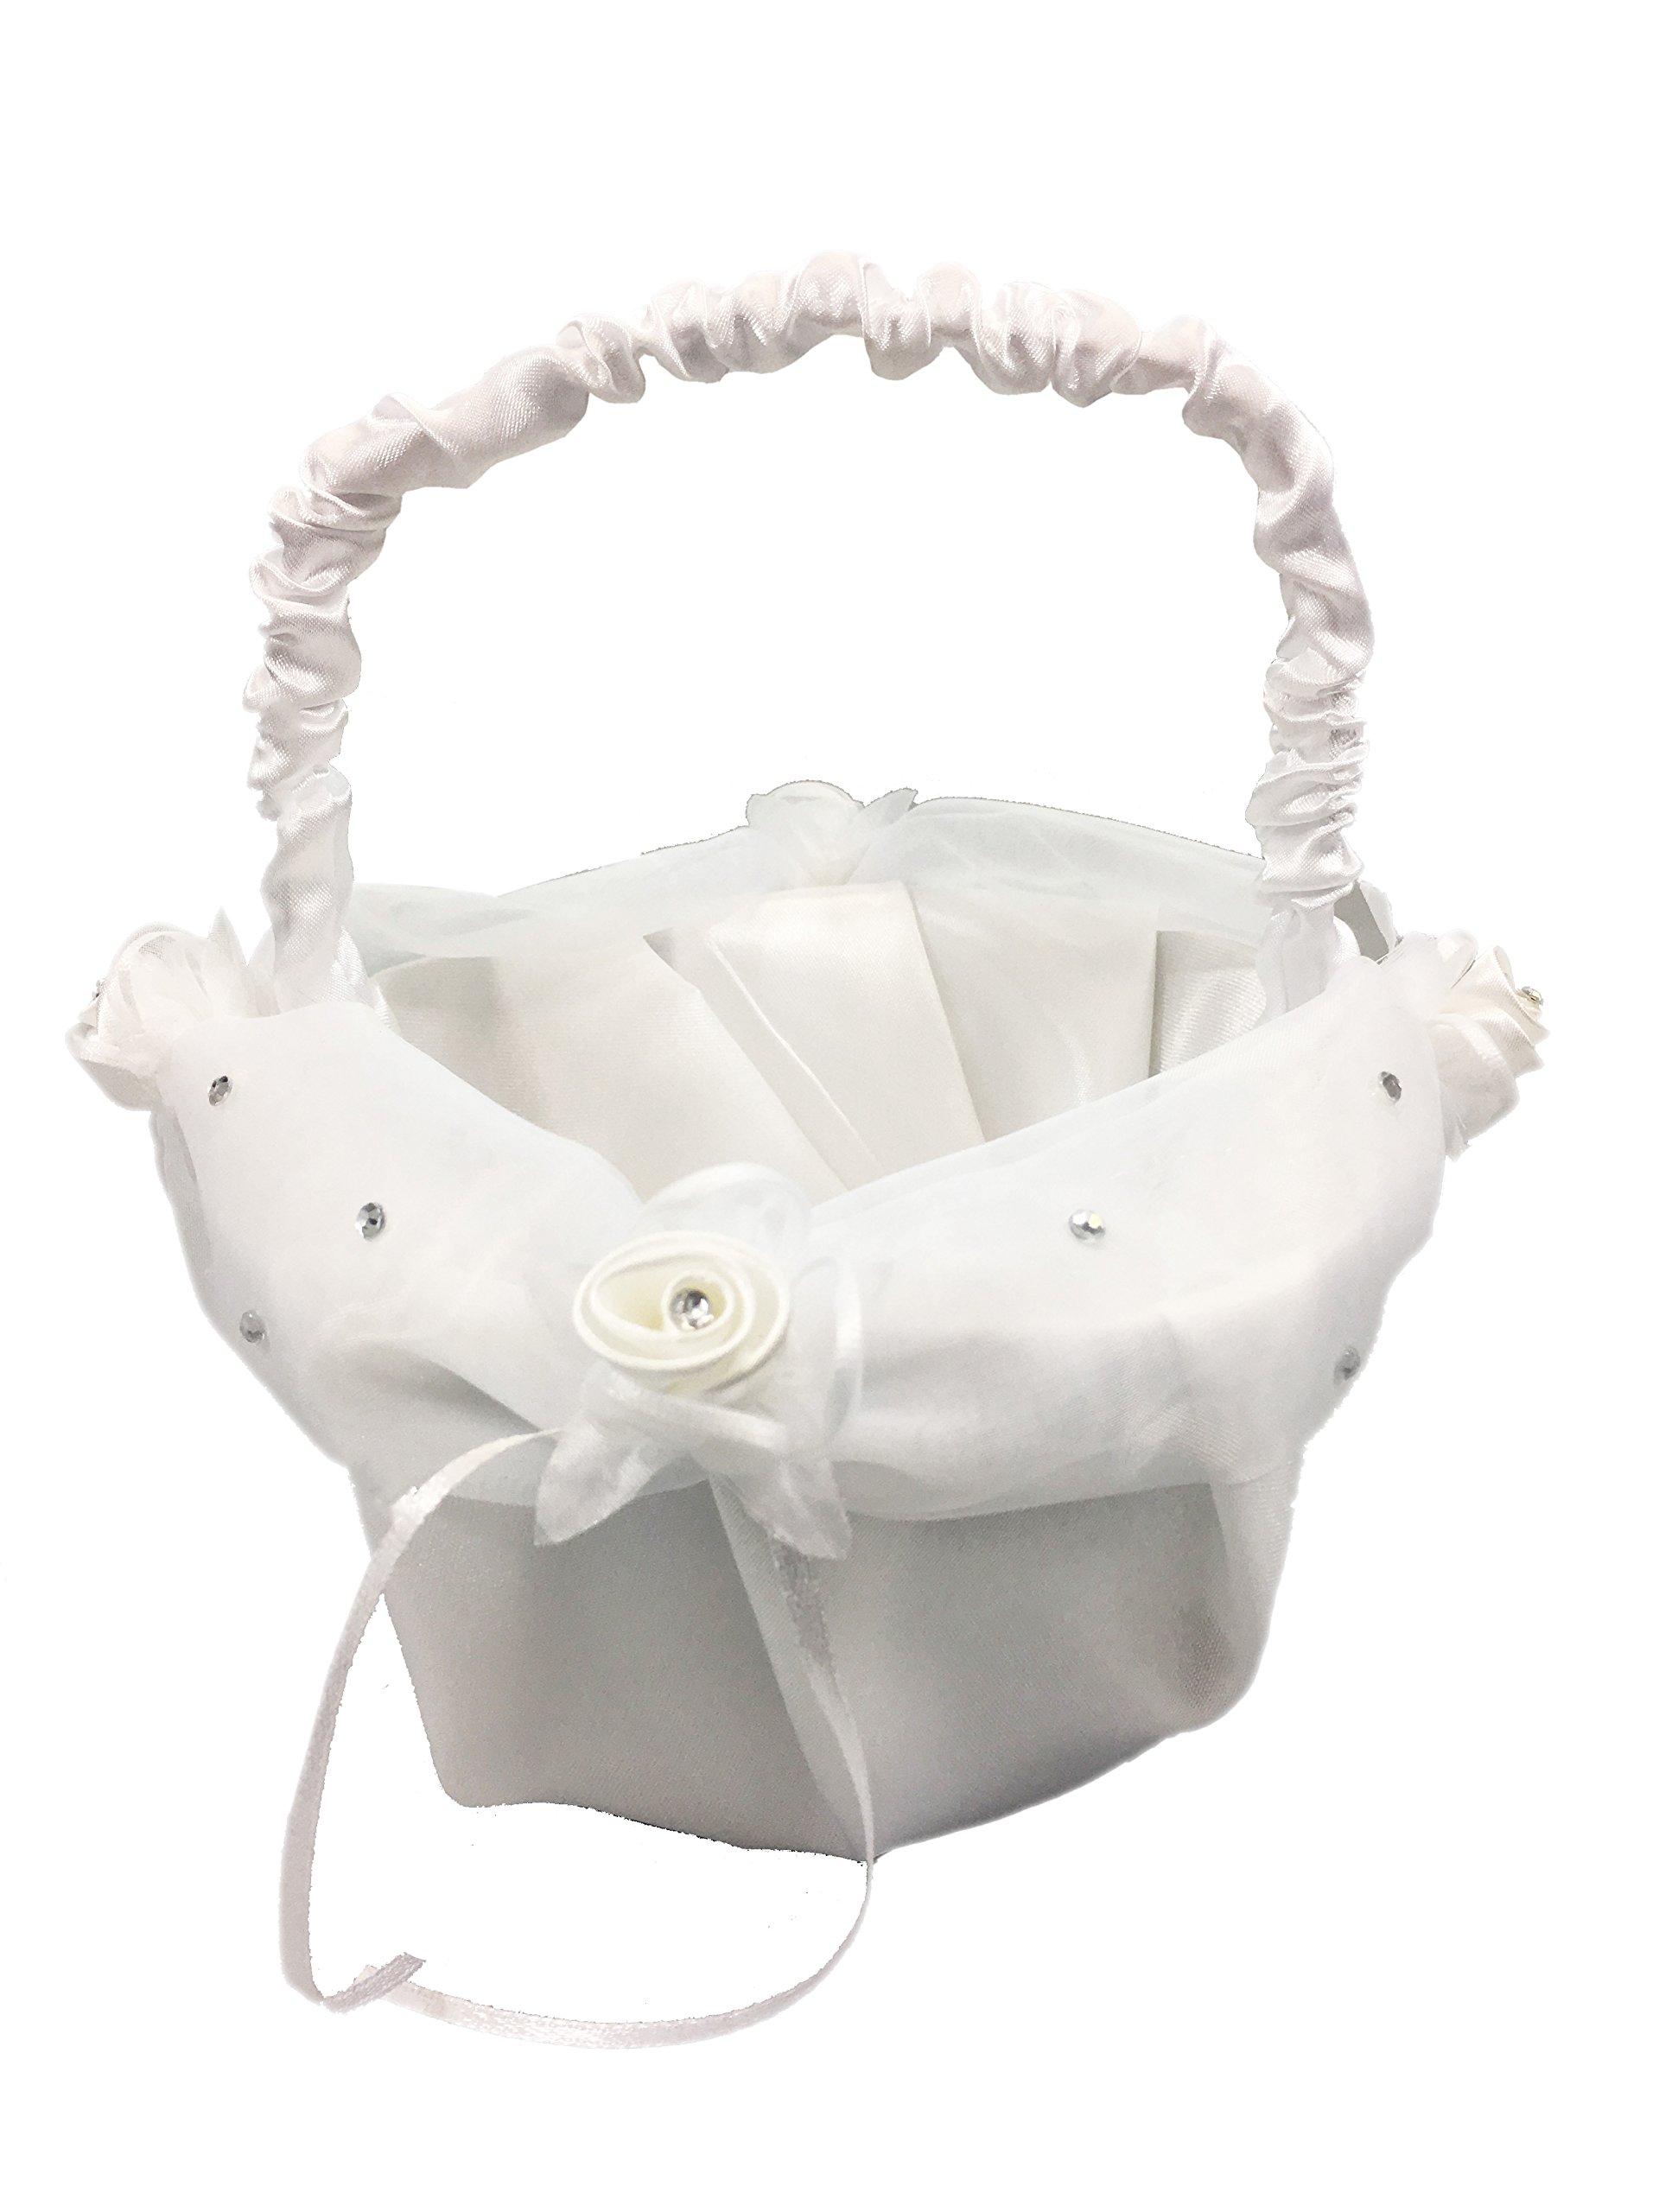 8.5'' Inch White Satin Wedding Basket with Petals & Rhinestones - For Flower Girl, Flowers, Roses, Petals, Anniversaries, & Weddings (Basket 1, Turquoise Petals)